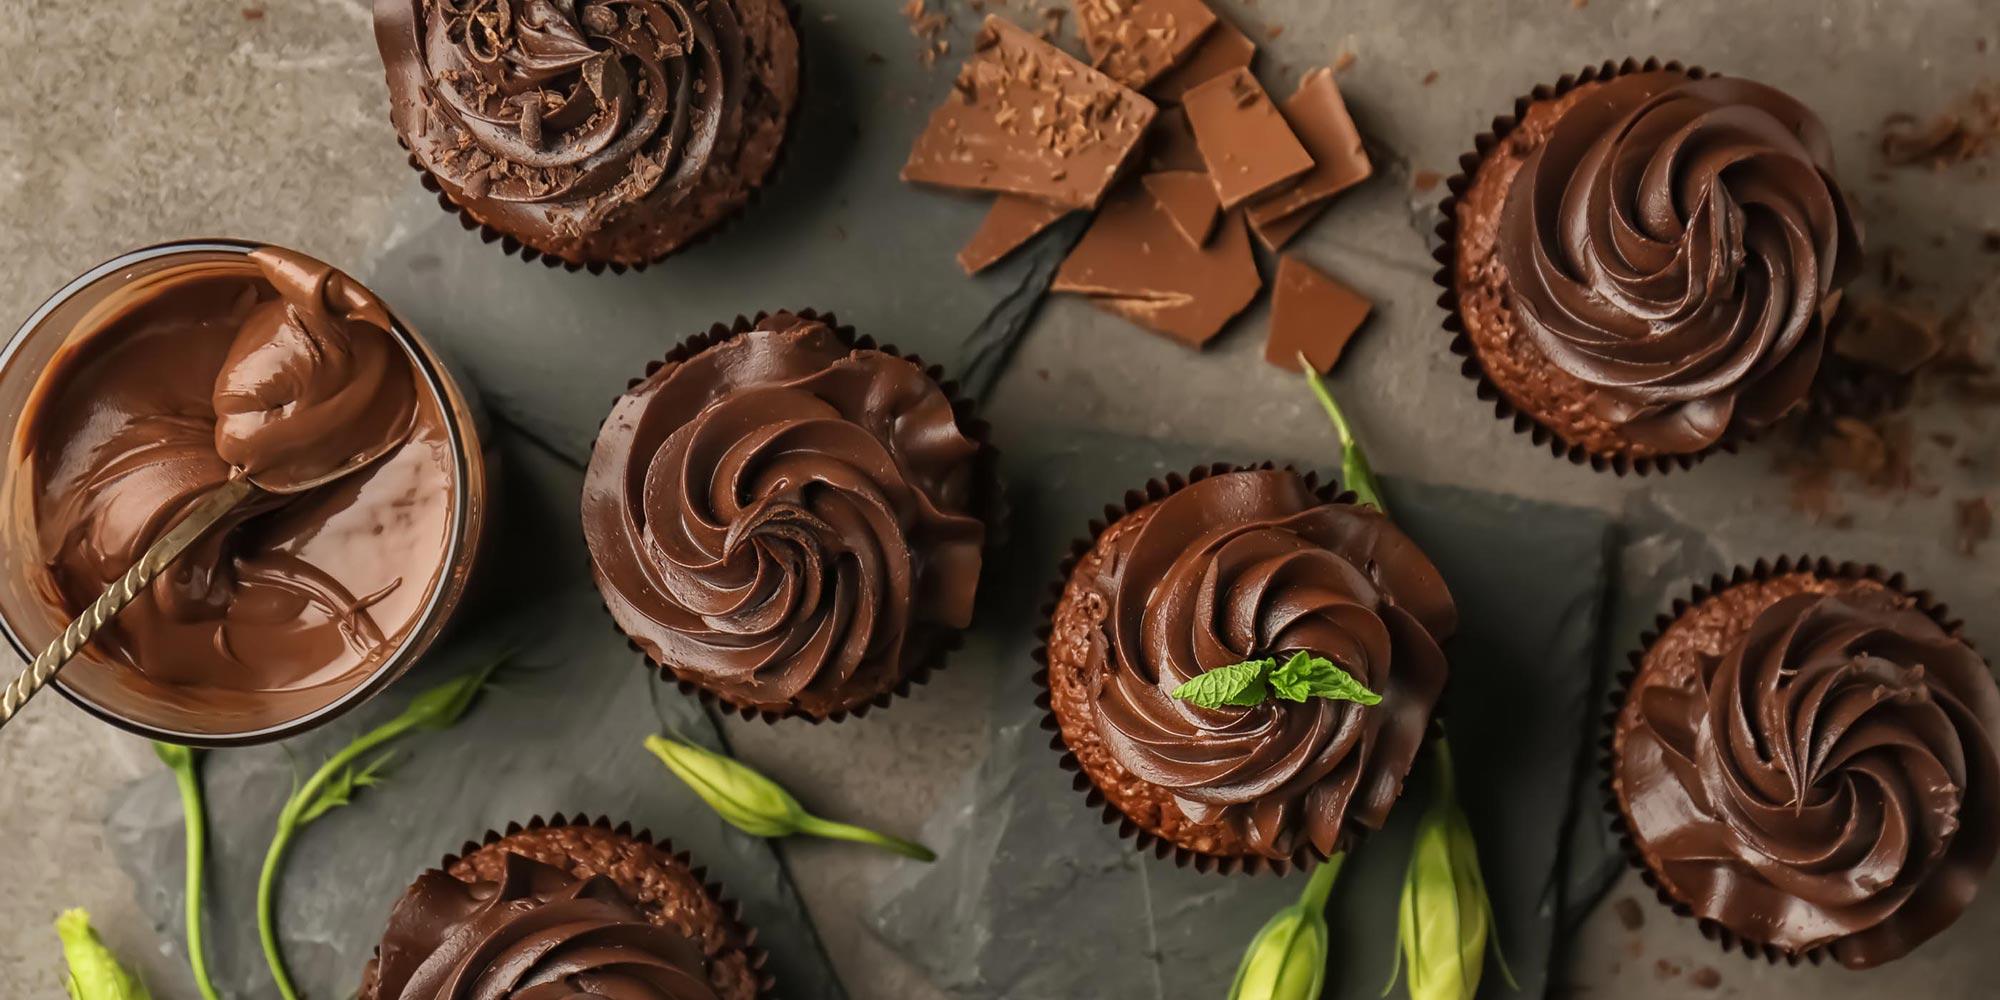 Rich Chocolate Frosting Recipe No Calorie Sweetener Sugar Substitute Splenda Sweeteners